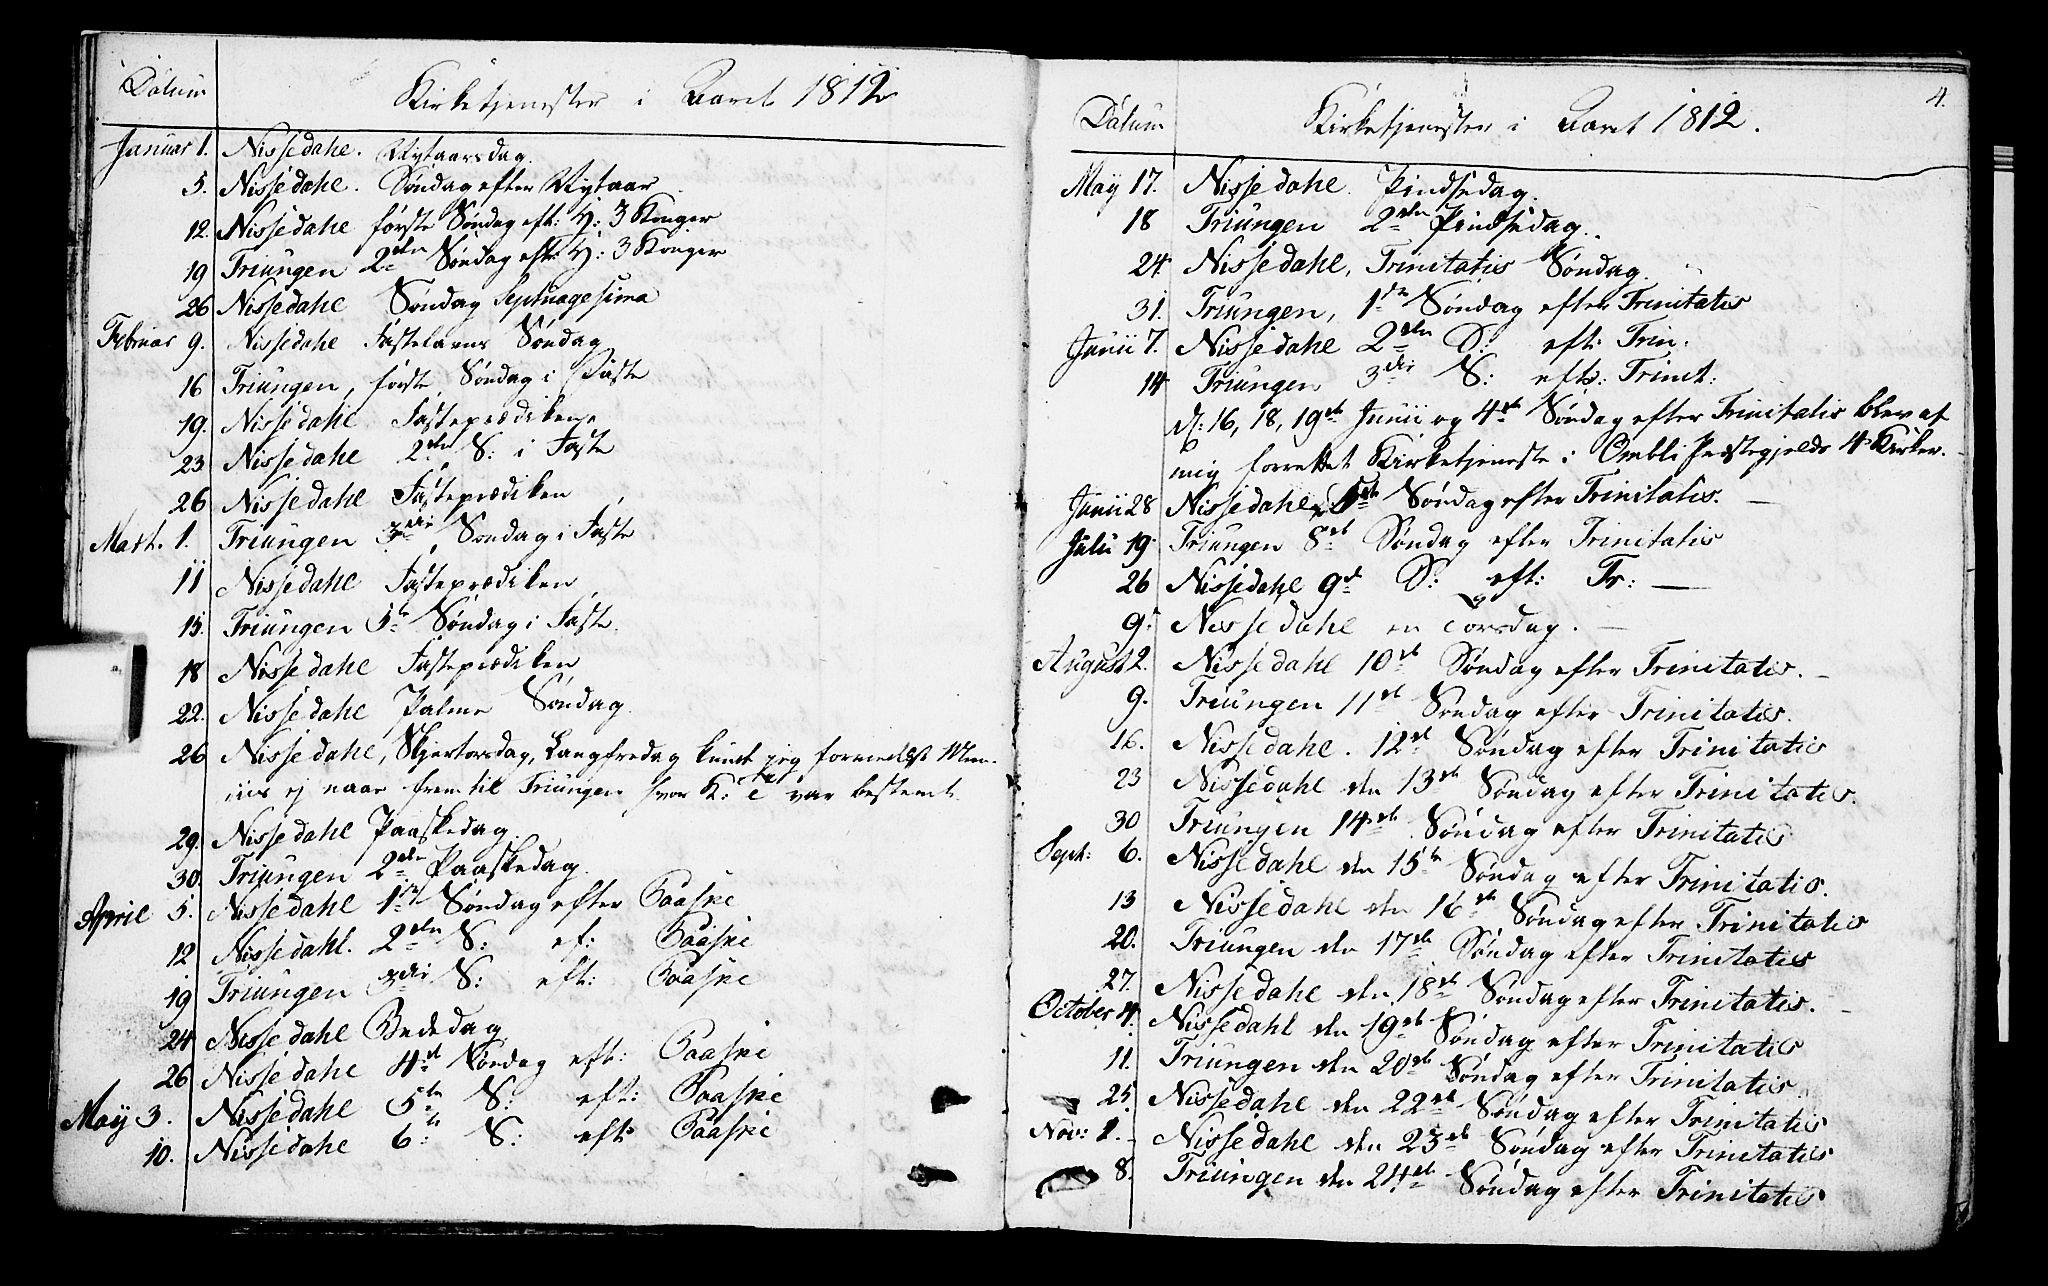 SAKO, Nissedal kirkebøker, F/Fa/L0001: Parish register (official) no. I 1, 1811-1814, p. 4